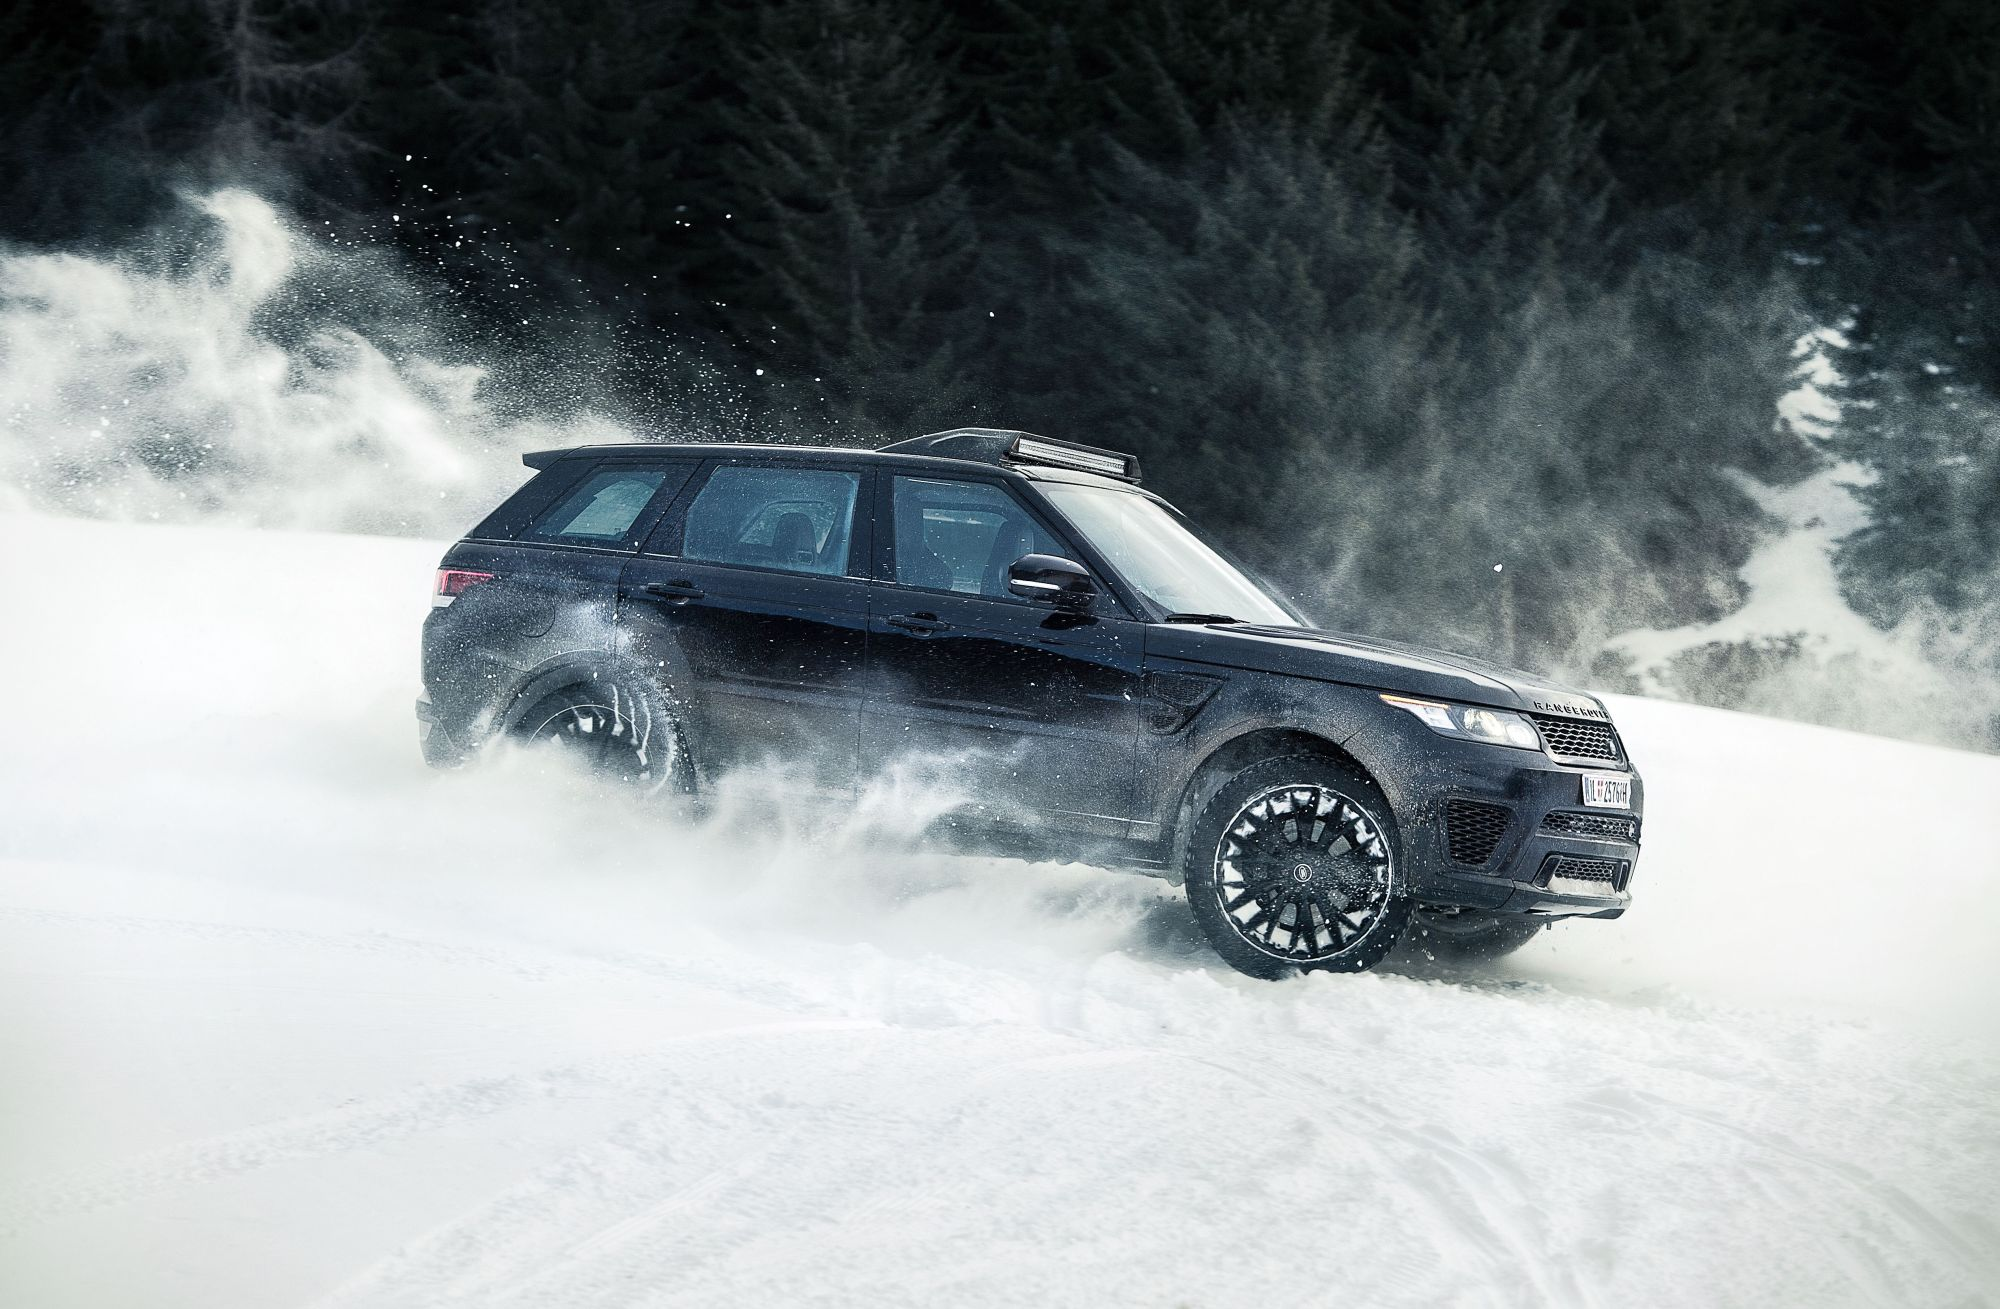 Land Rover Discovery Sport - forrás: Landrover.com